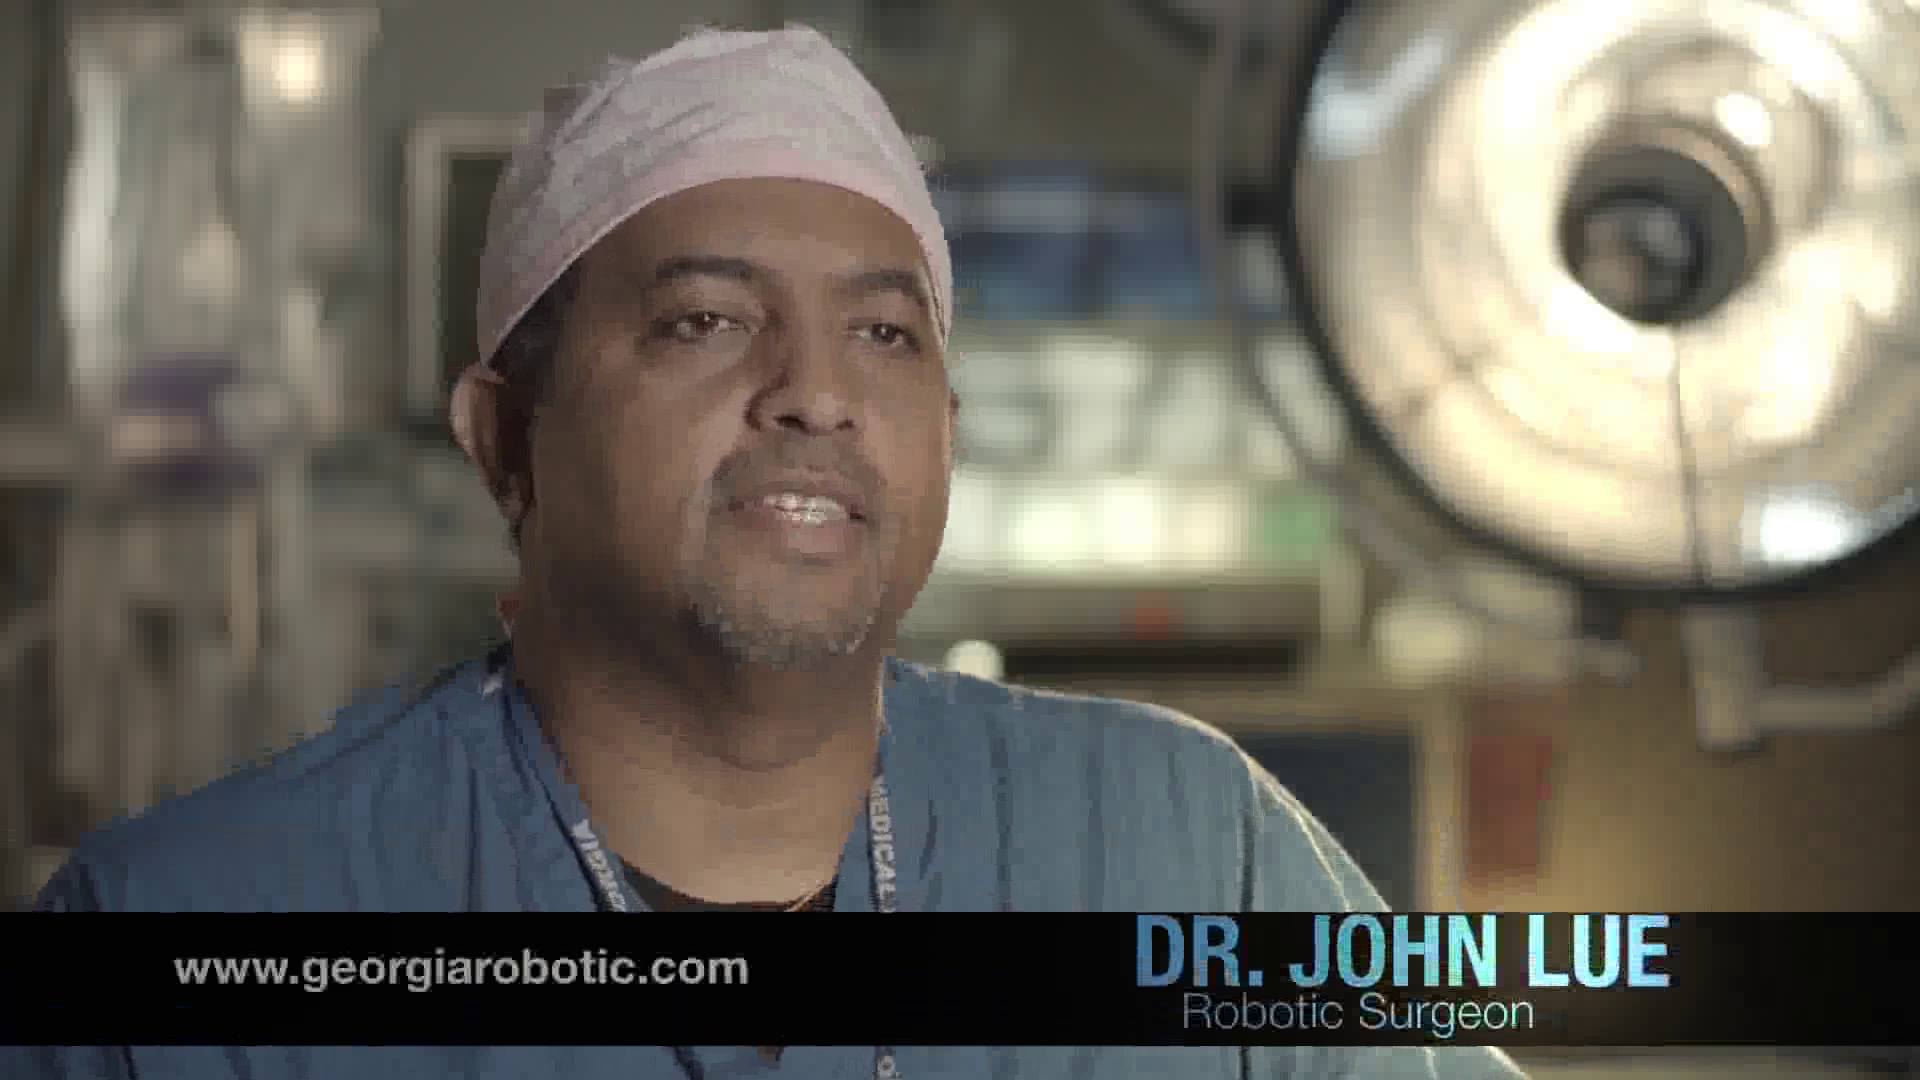 Dr. Lue talks about his practice